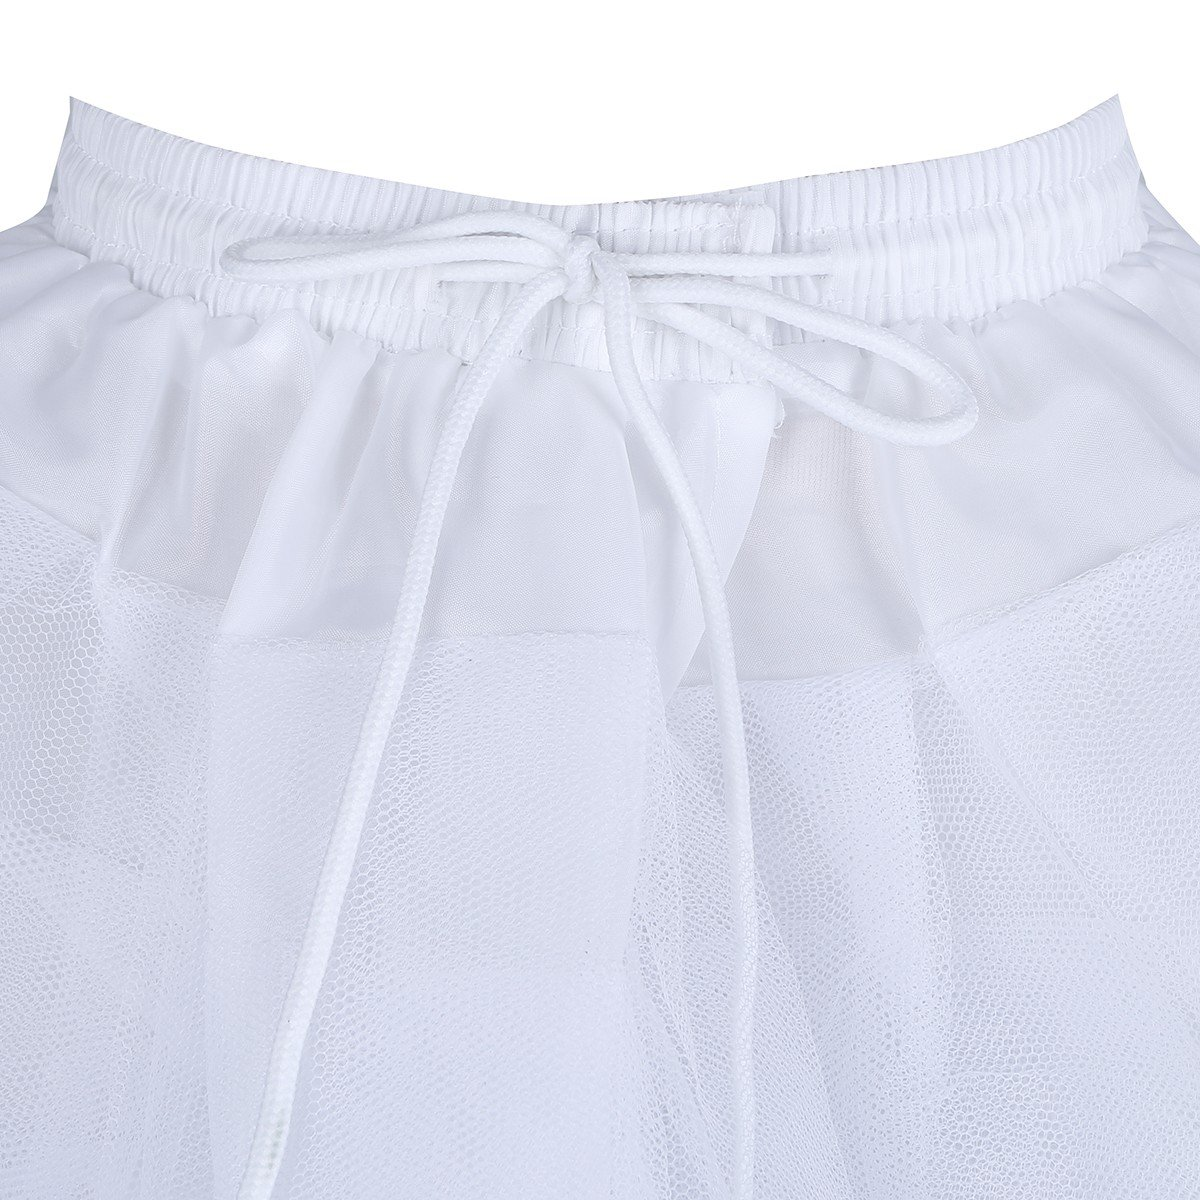 TiaoBug Kids Flower Girls 3 Layers Net Pageant Evening Wedding Dress Underskirt Crinoline Slip Bridesmaid Skirt Petticoat